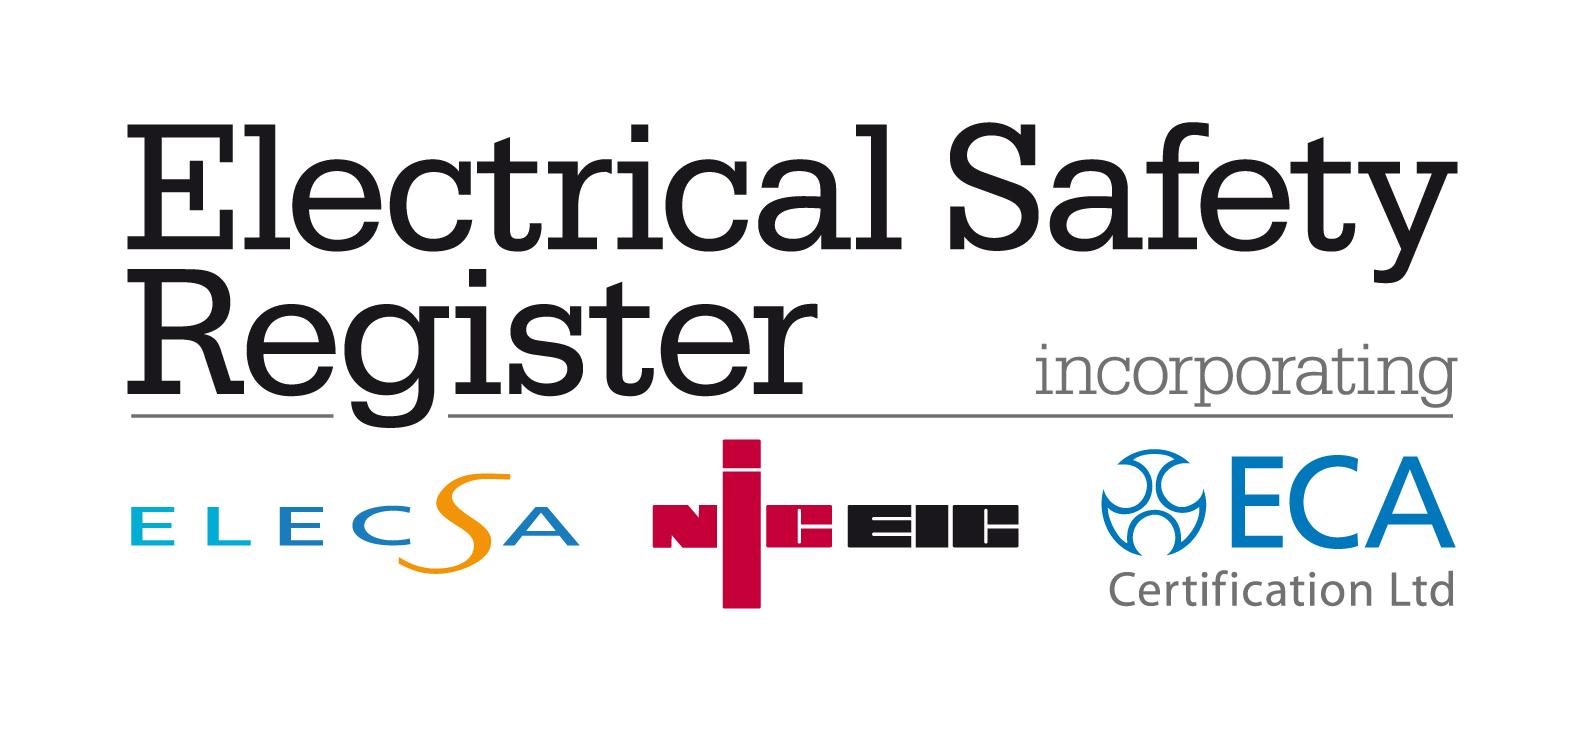 ECS_logo_RGB_strap_under.JPG